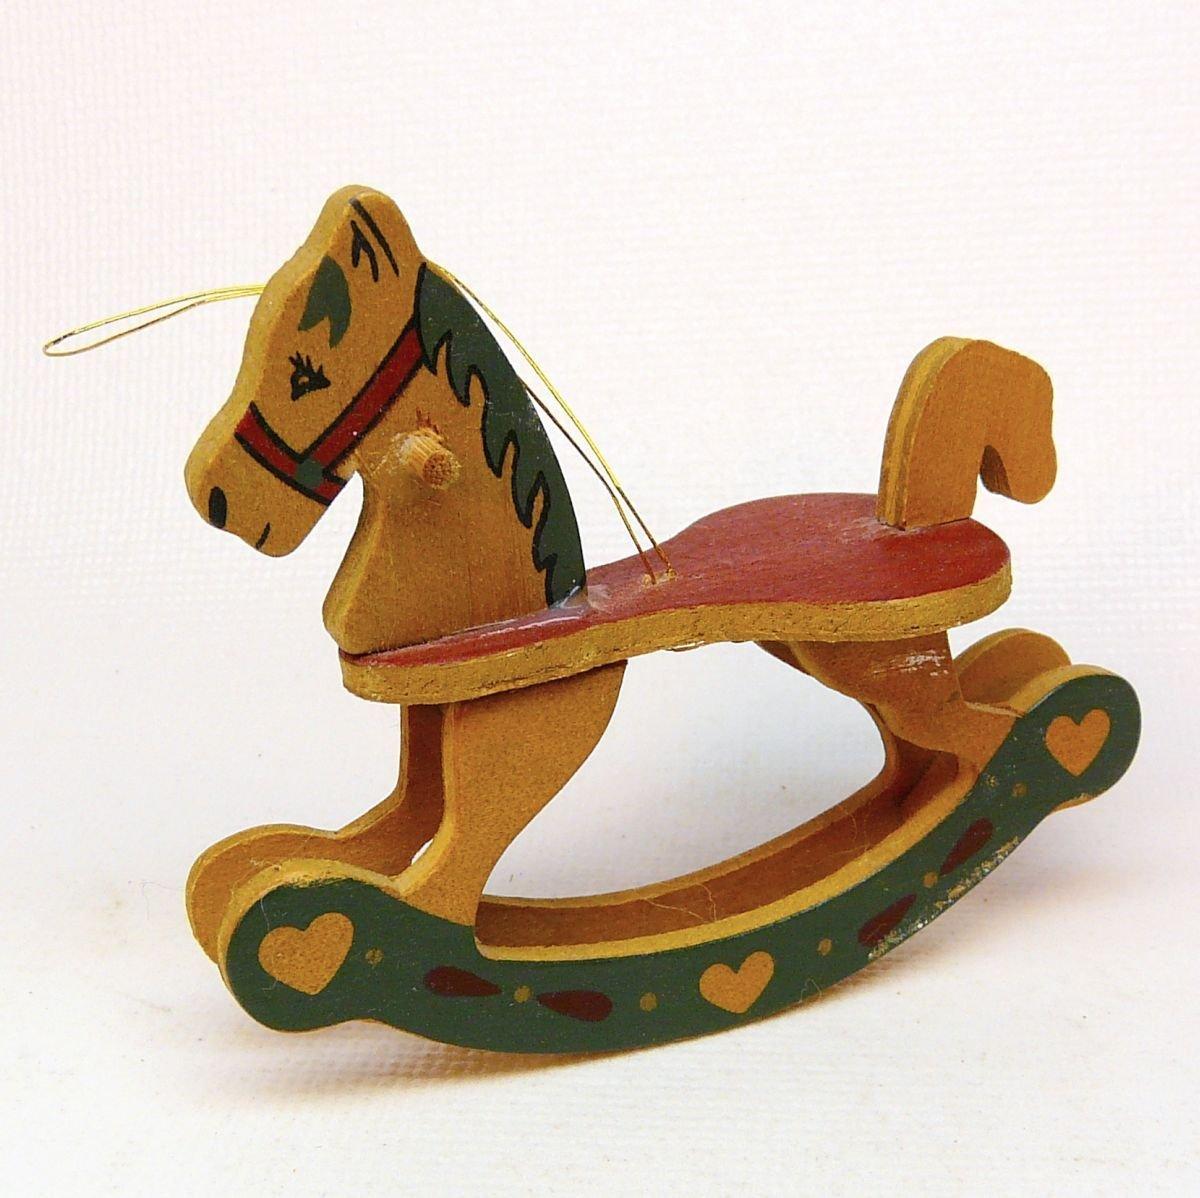 vintage wooden rocking horse Christmas ornament